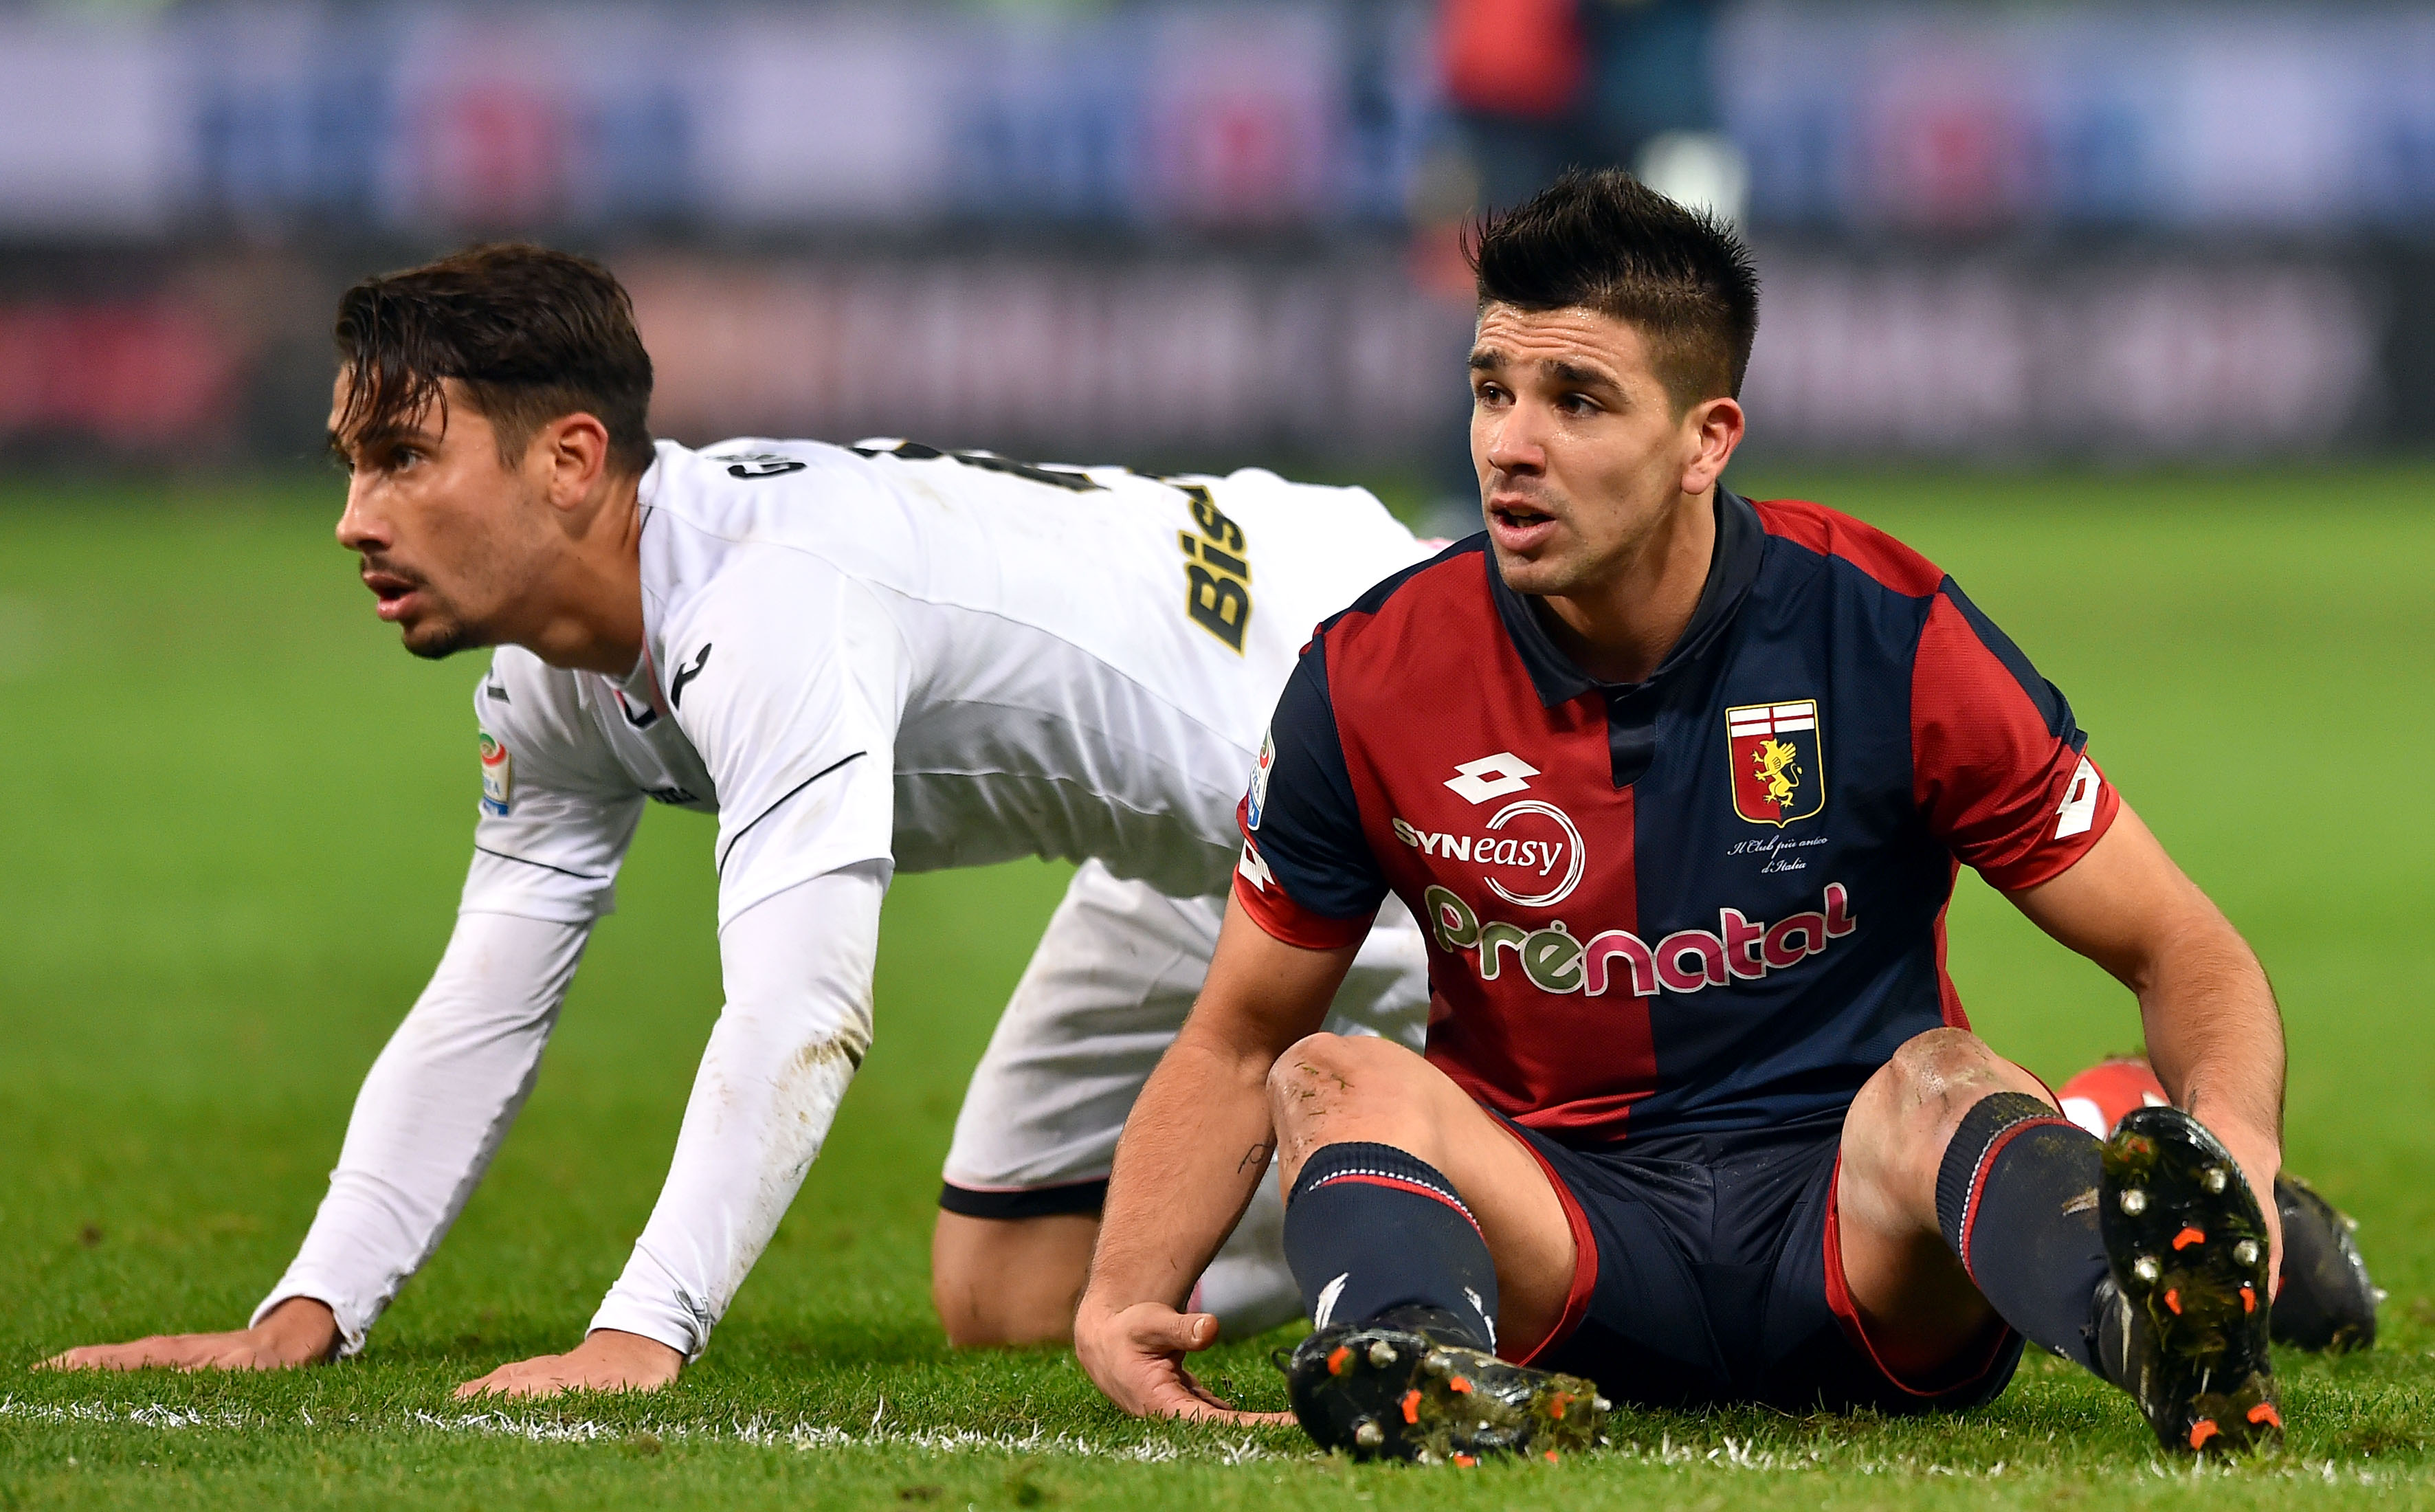 Genova, 18/12/2016 Serie A/Genoa-Palermo Edoardo Goldaniga-Giovanni Pablo Simeone